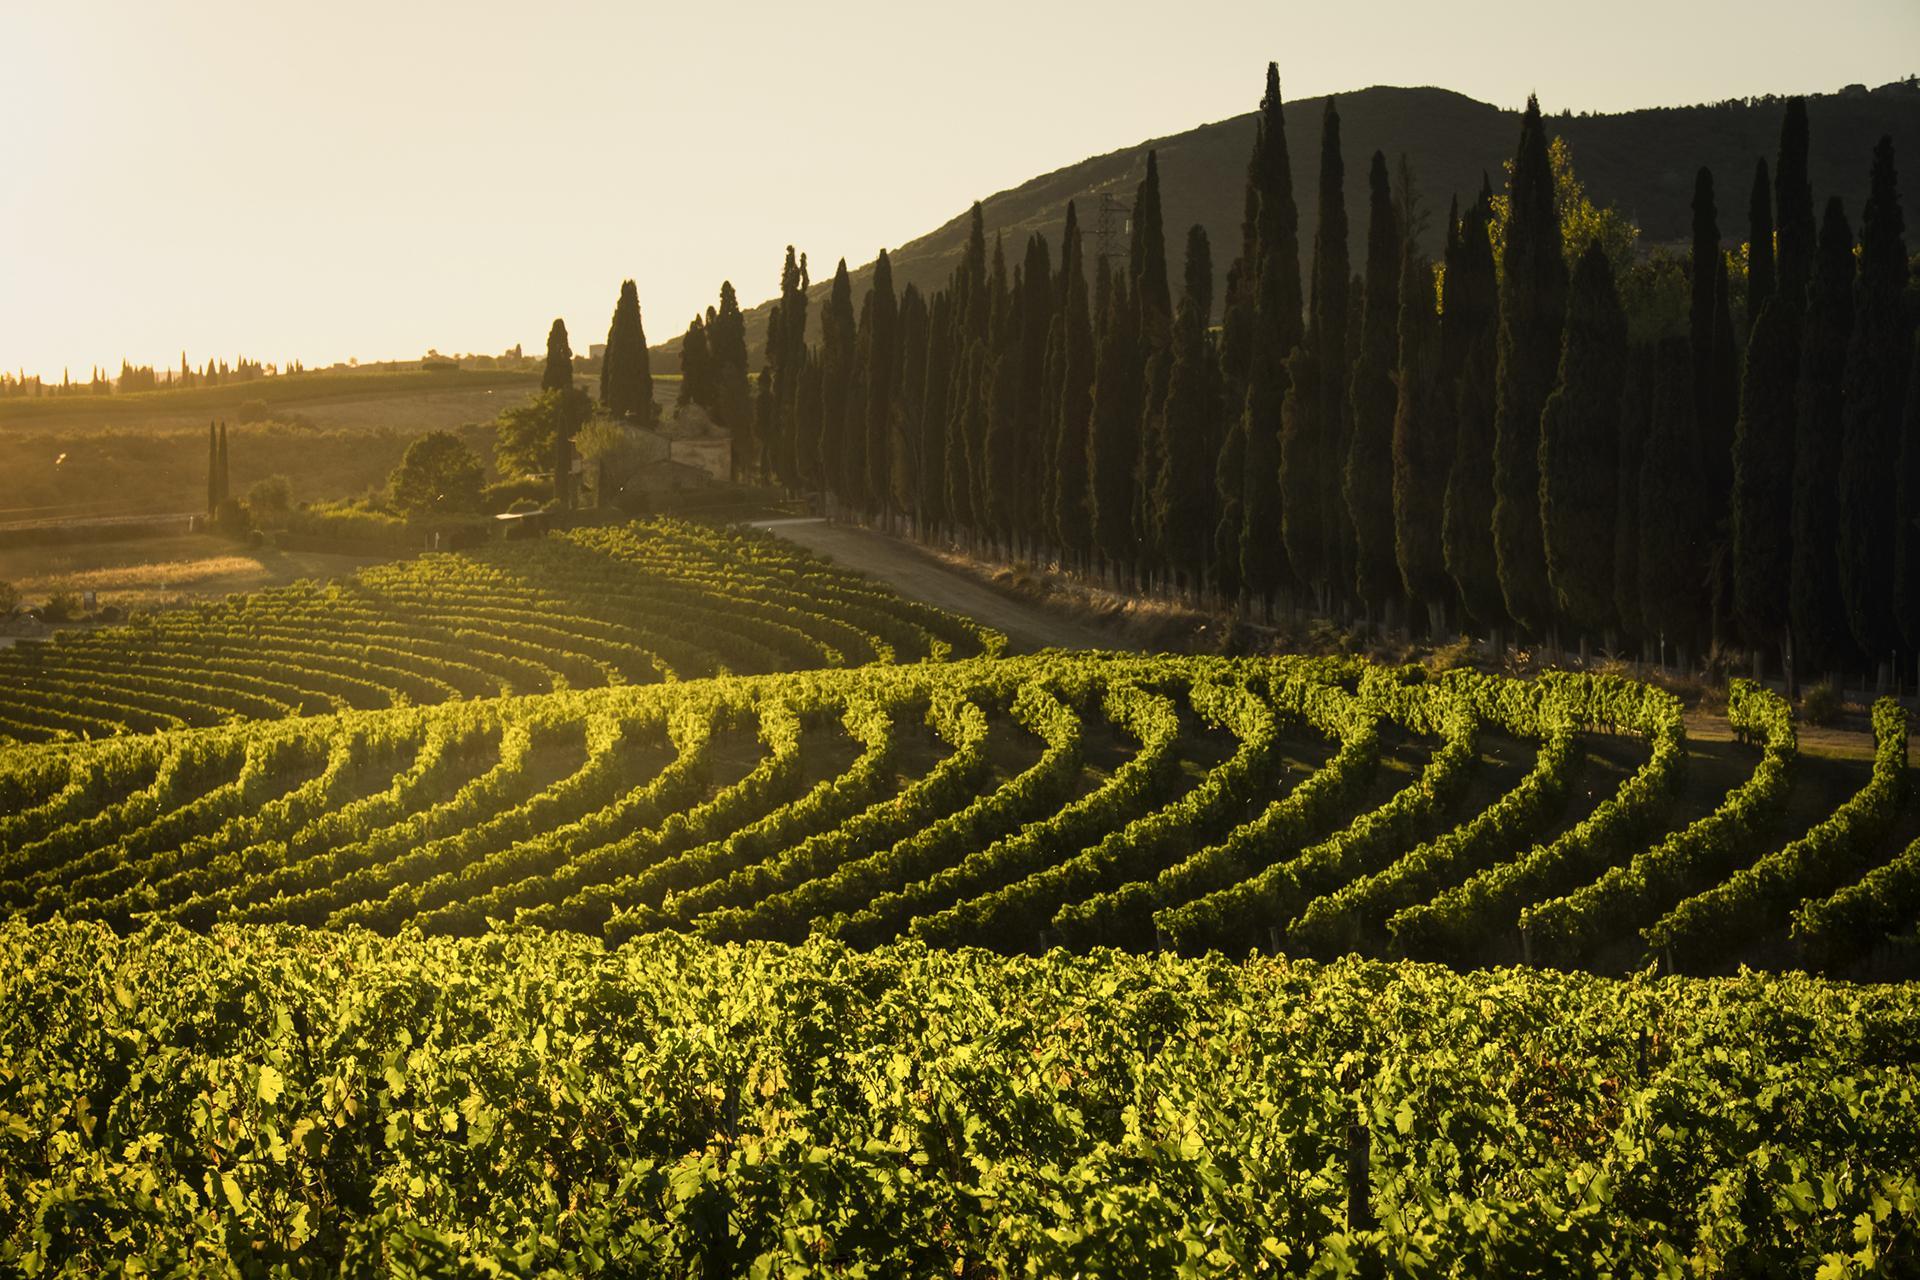 Tenuta di Arceno Vineyards at Sunset